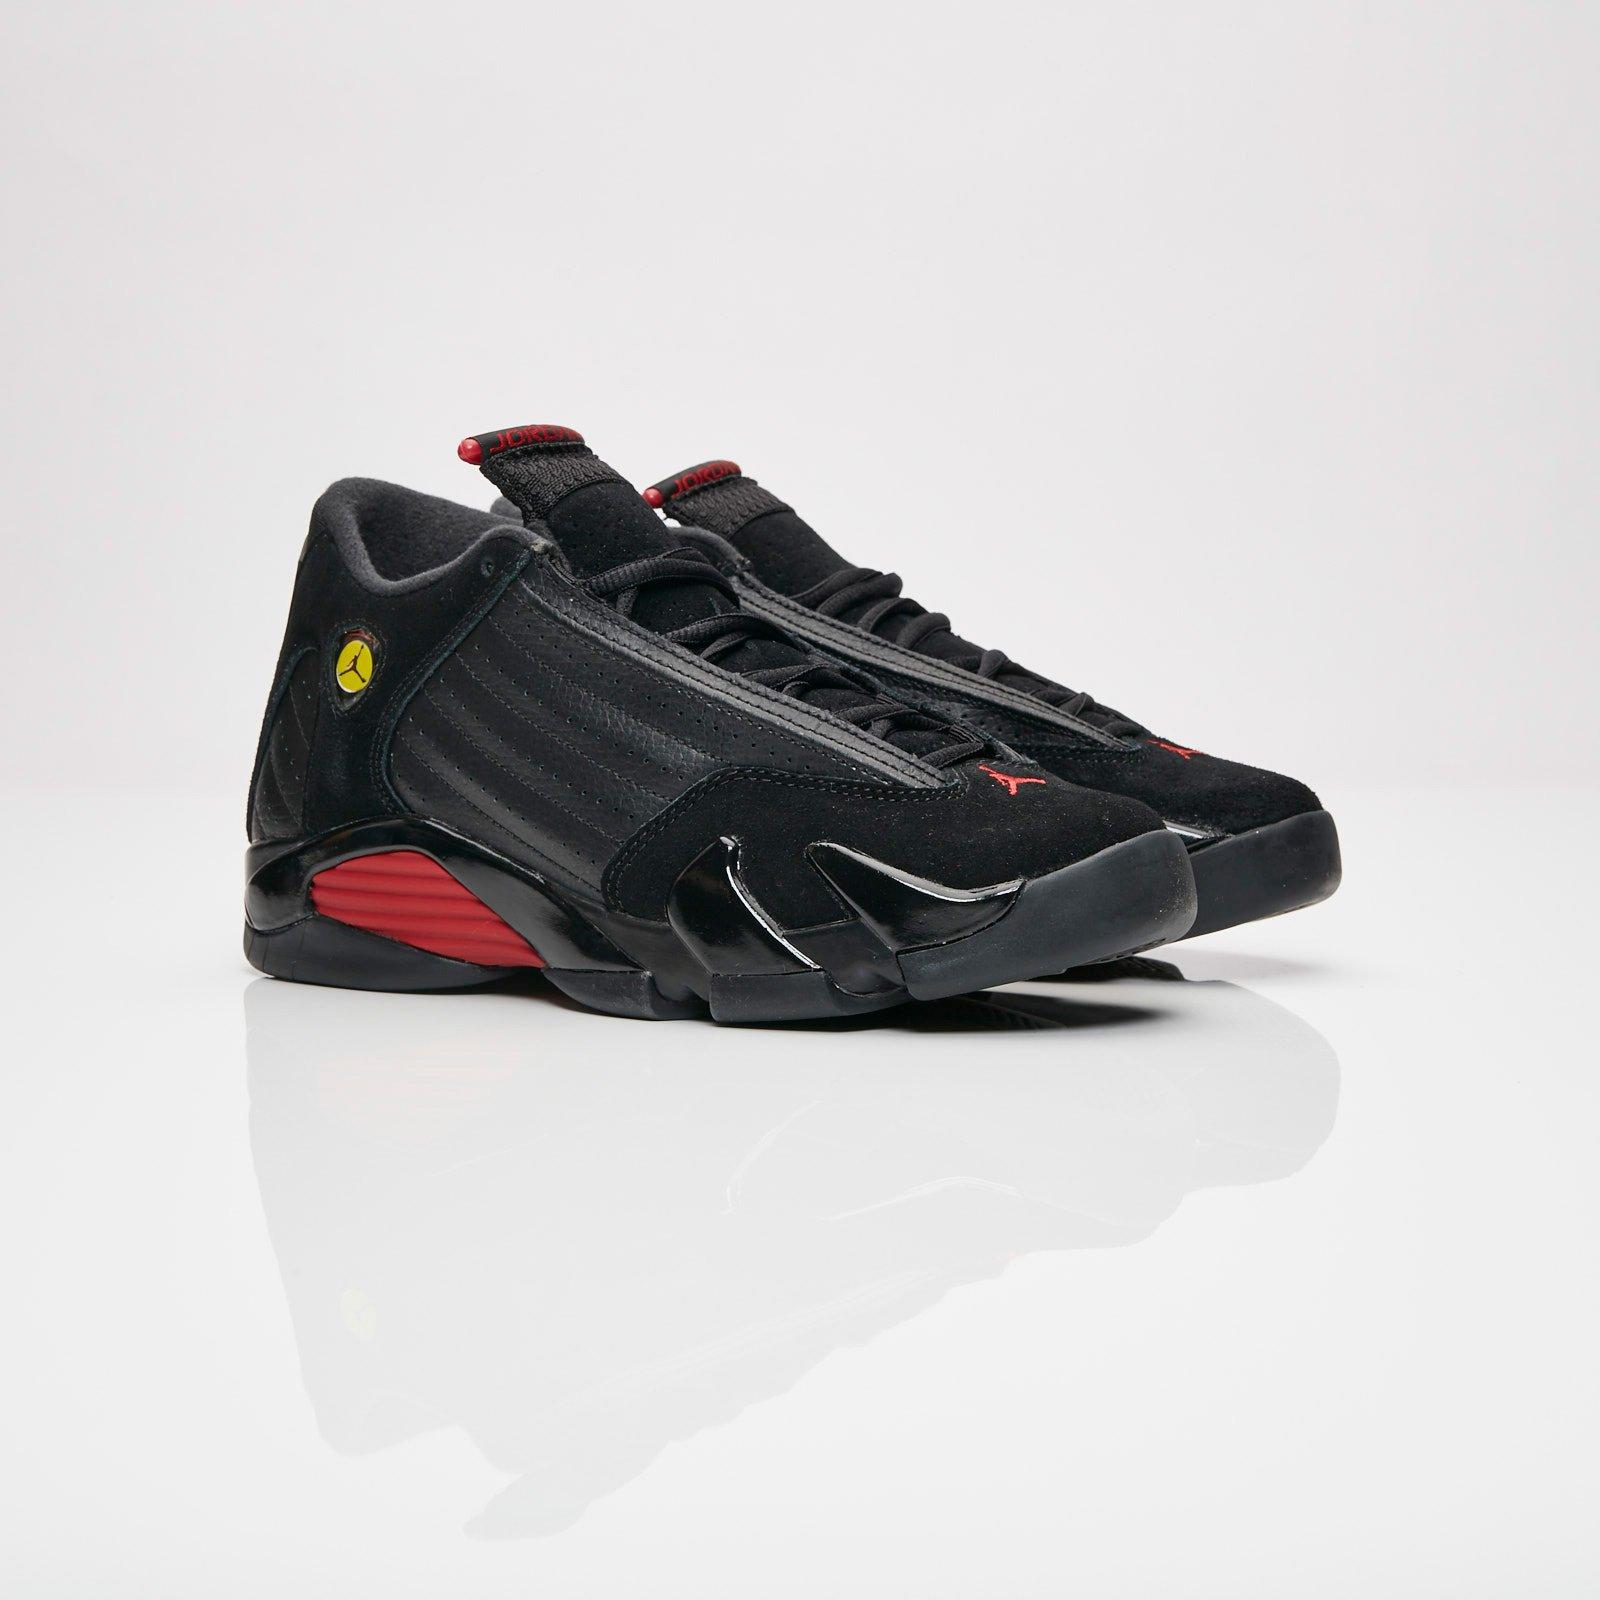 fca86cc962dd Jordan Brand Air Jordan 14 Retro GS - 487524-003 - Sneakersnstuff ...